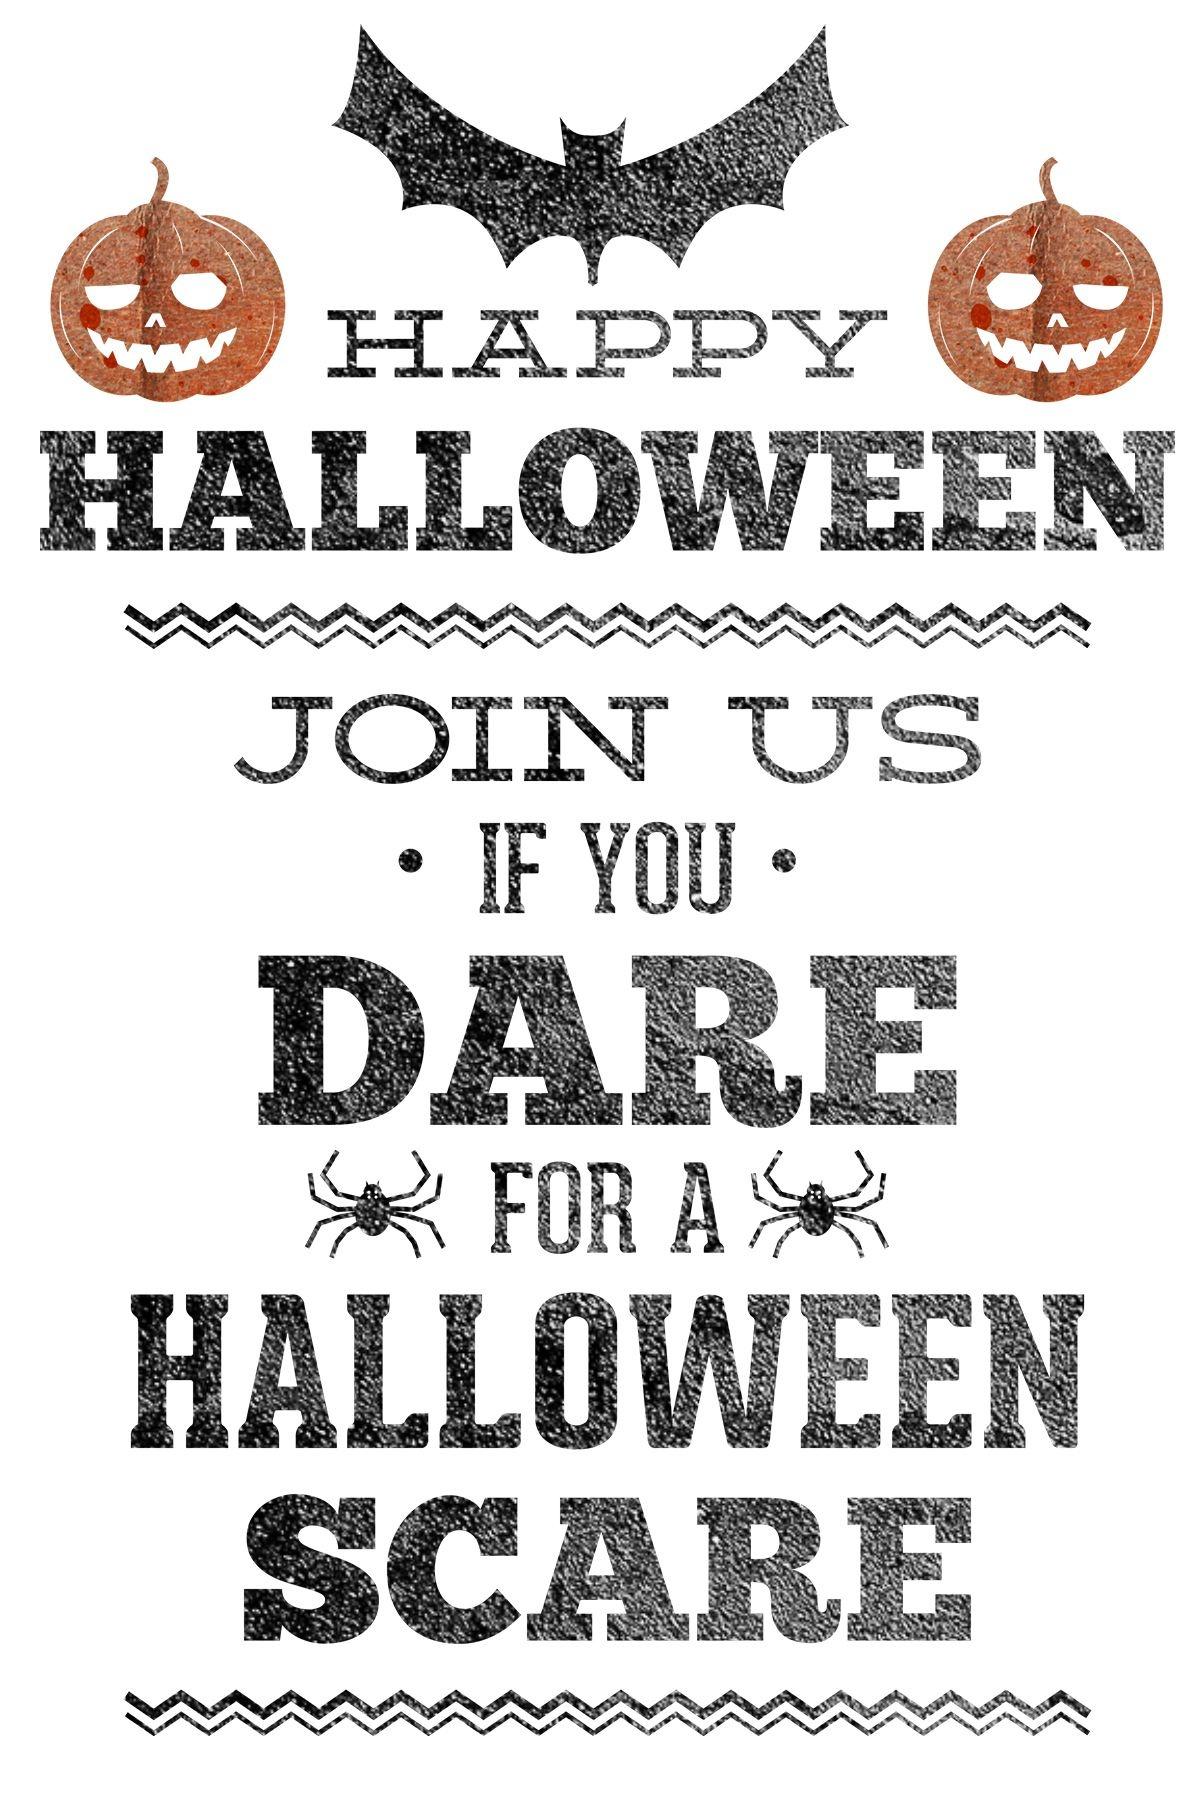 Free Printable Halloween Party Invitation | Halloween Printables 2 - Free Printable Halloween Invitations